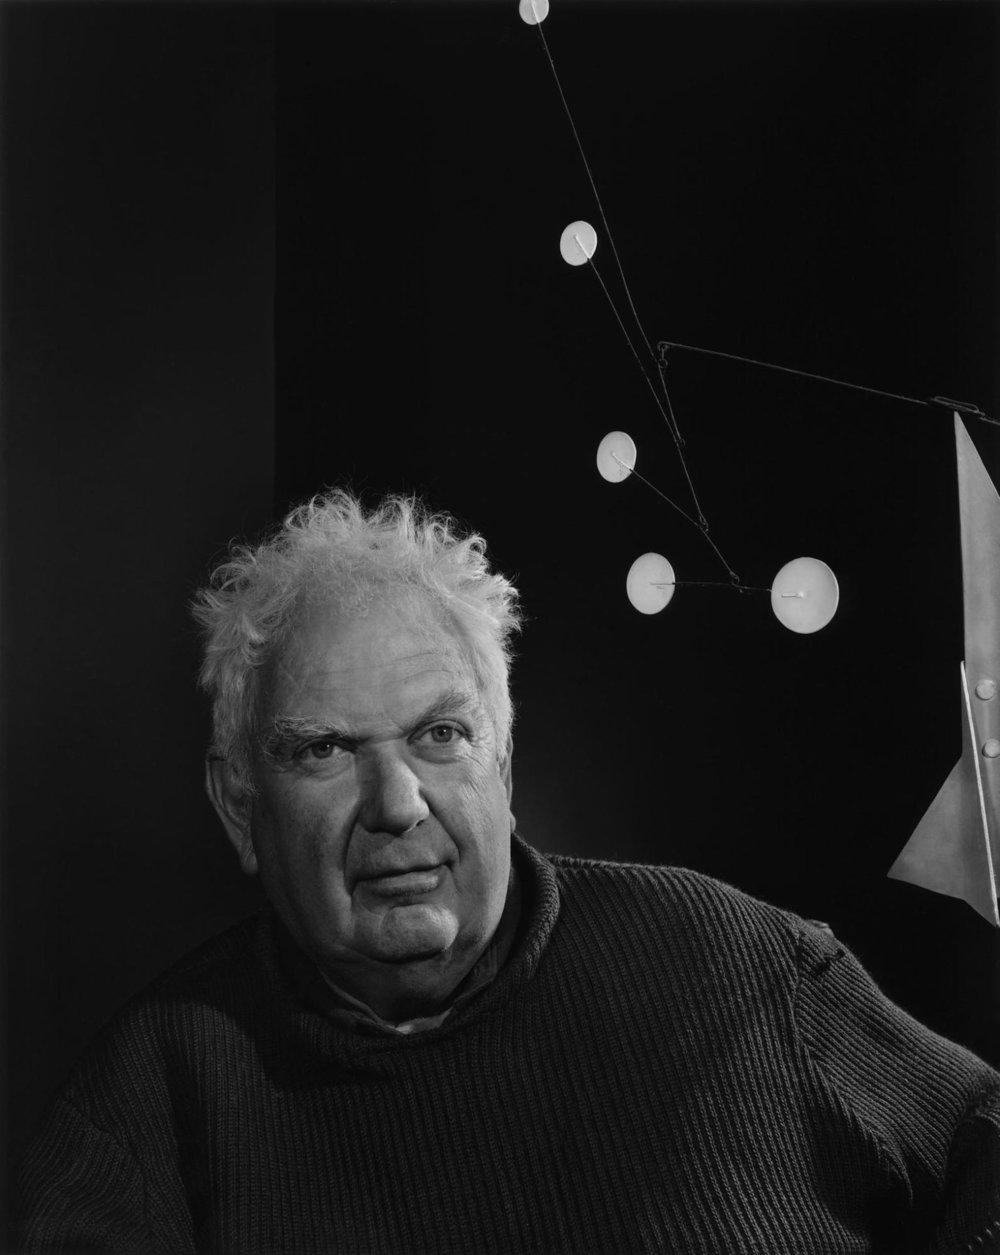 Portrait of artist Alexander Calder